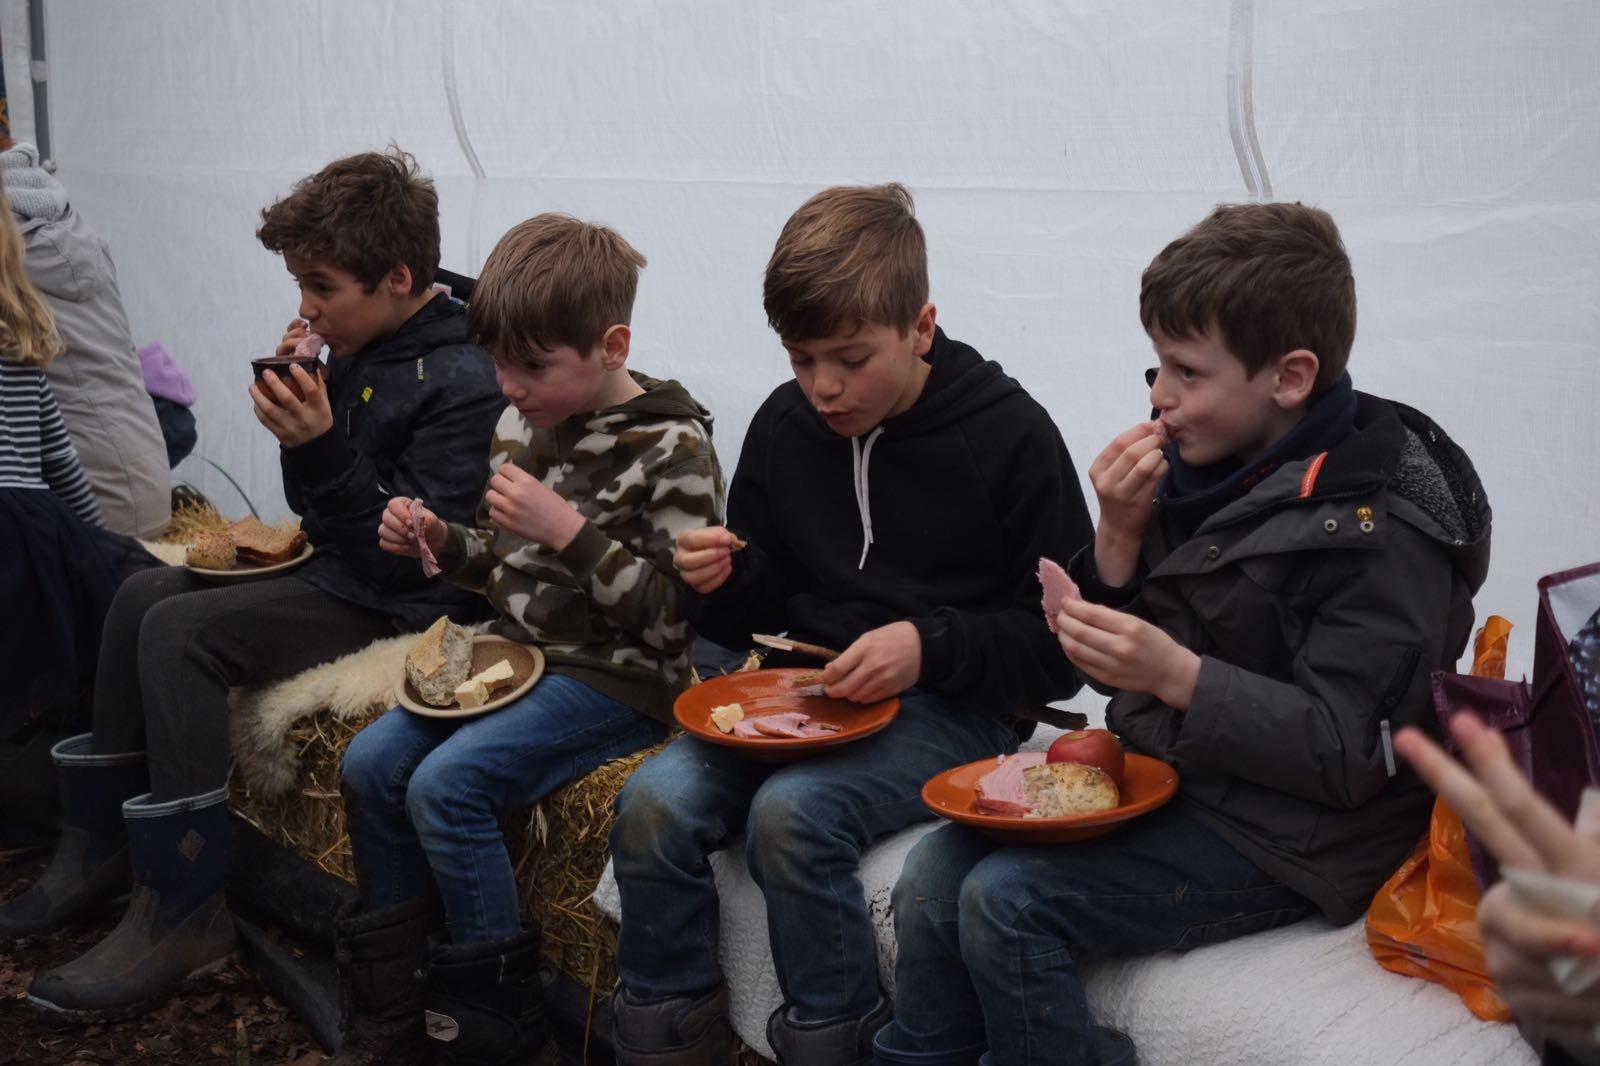 Feasting!